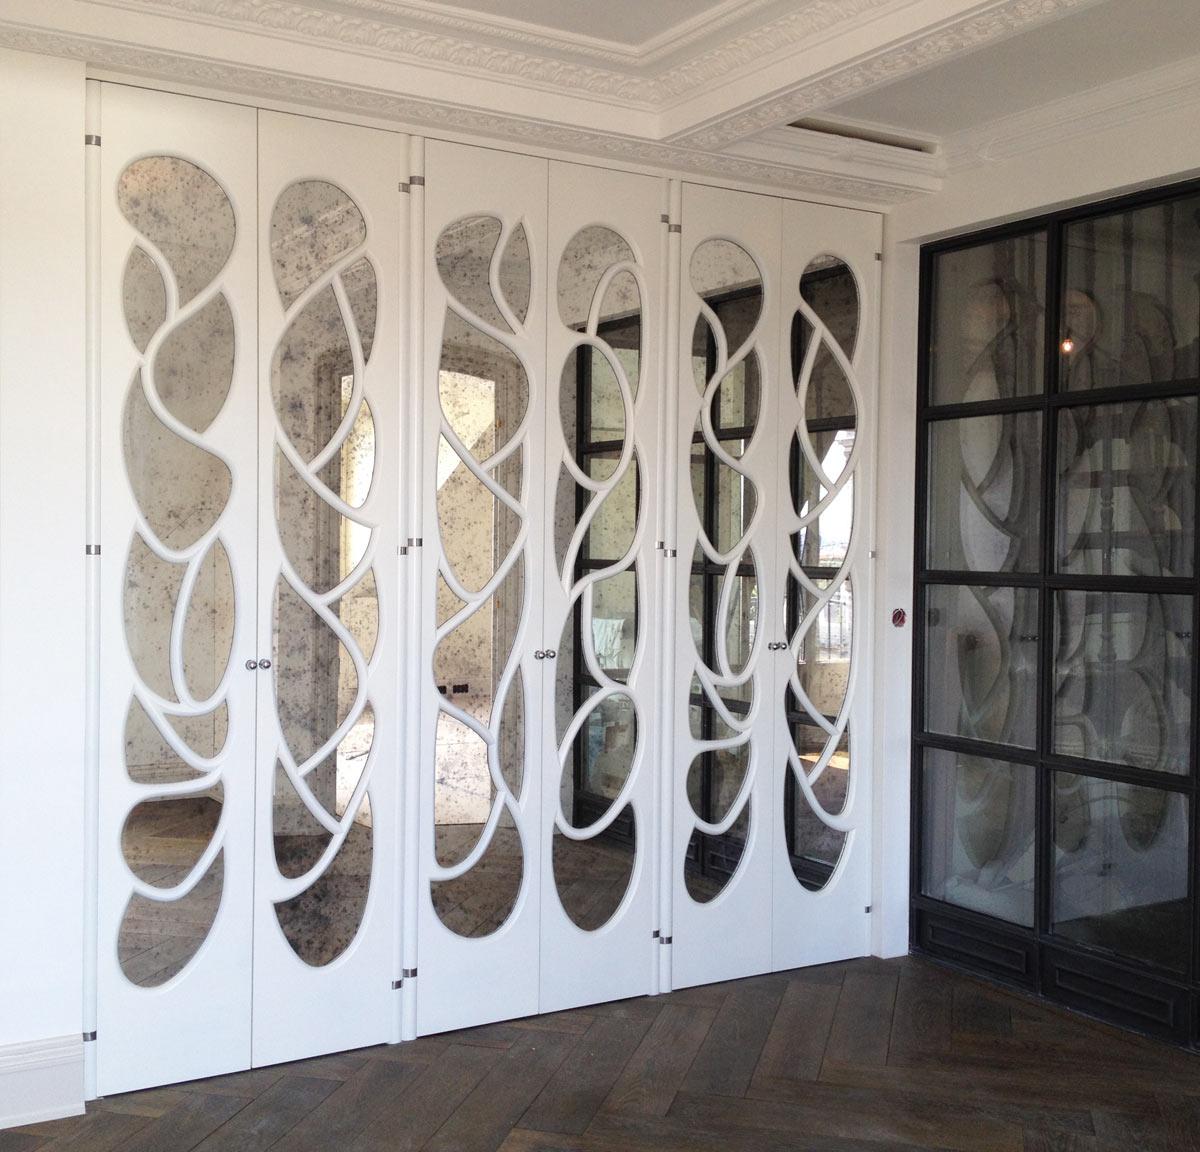 Portes miroirs arabesques b nisterie restauration for Meuble arabesque tunisie